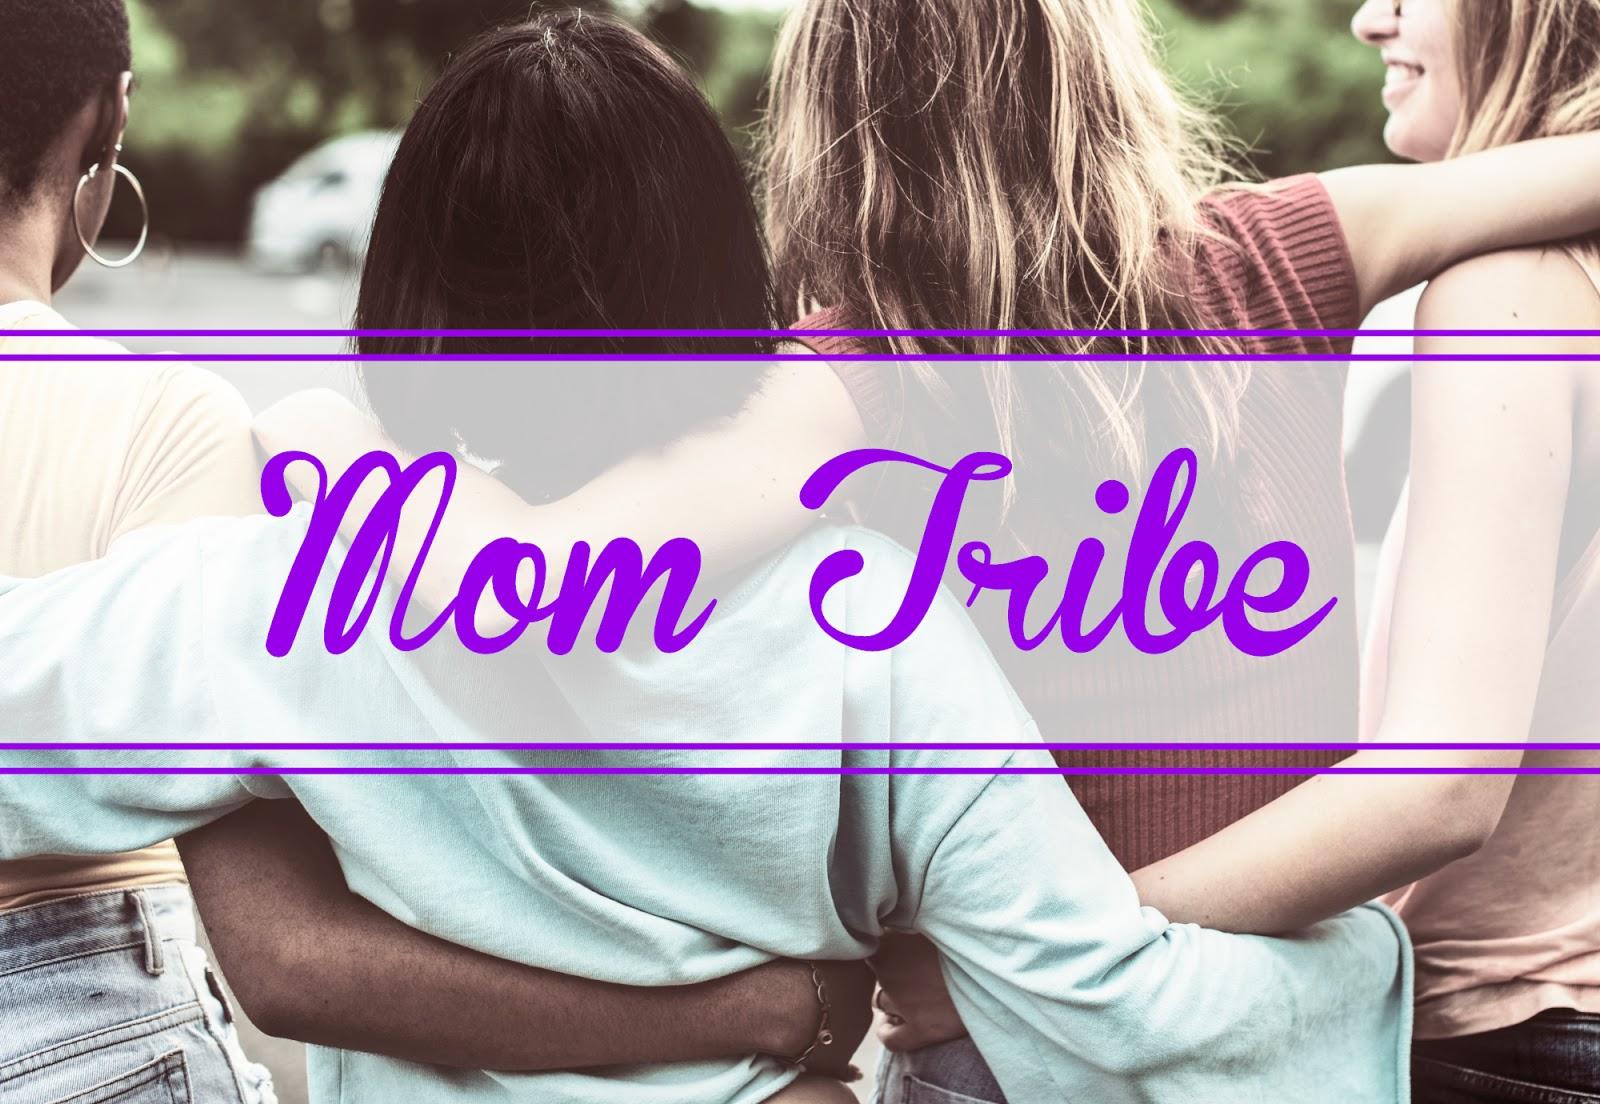 Mothers' Healing Circle | Tribe for Spiritual Birth Preparation, Birth Healing, Birth Trauma Support, Motherhood, Divine Feminine